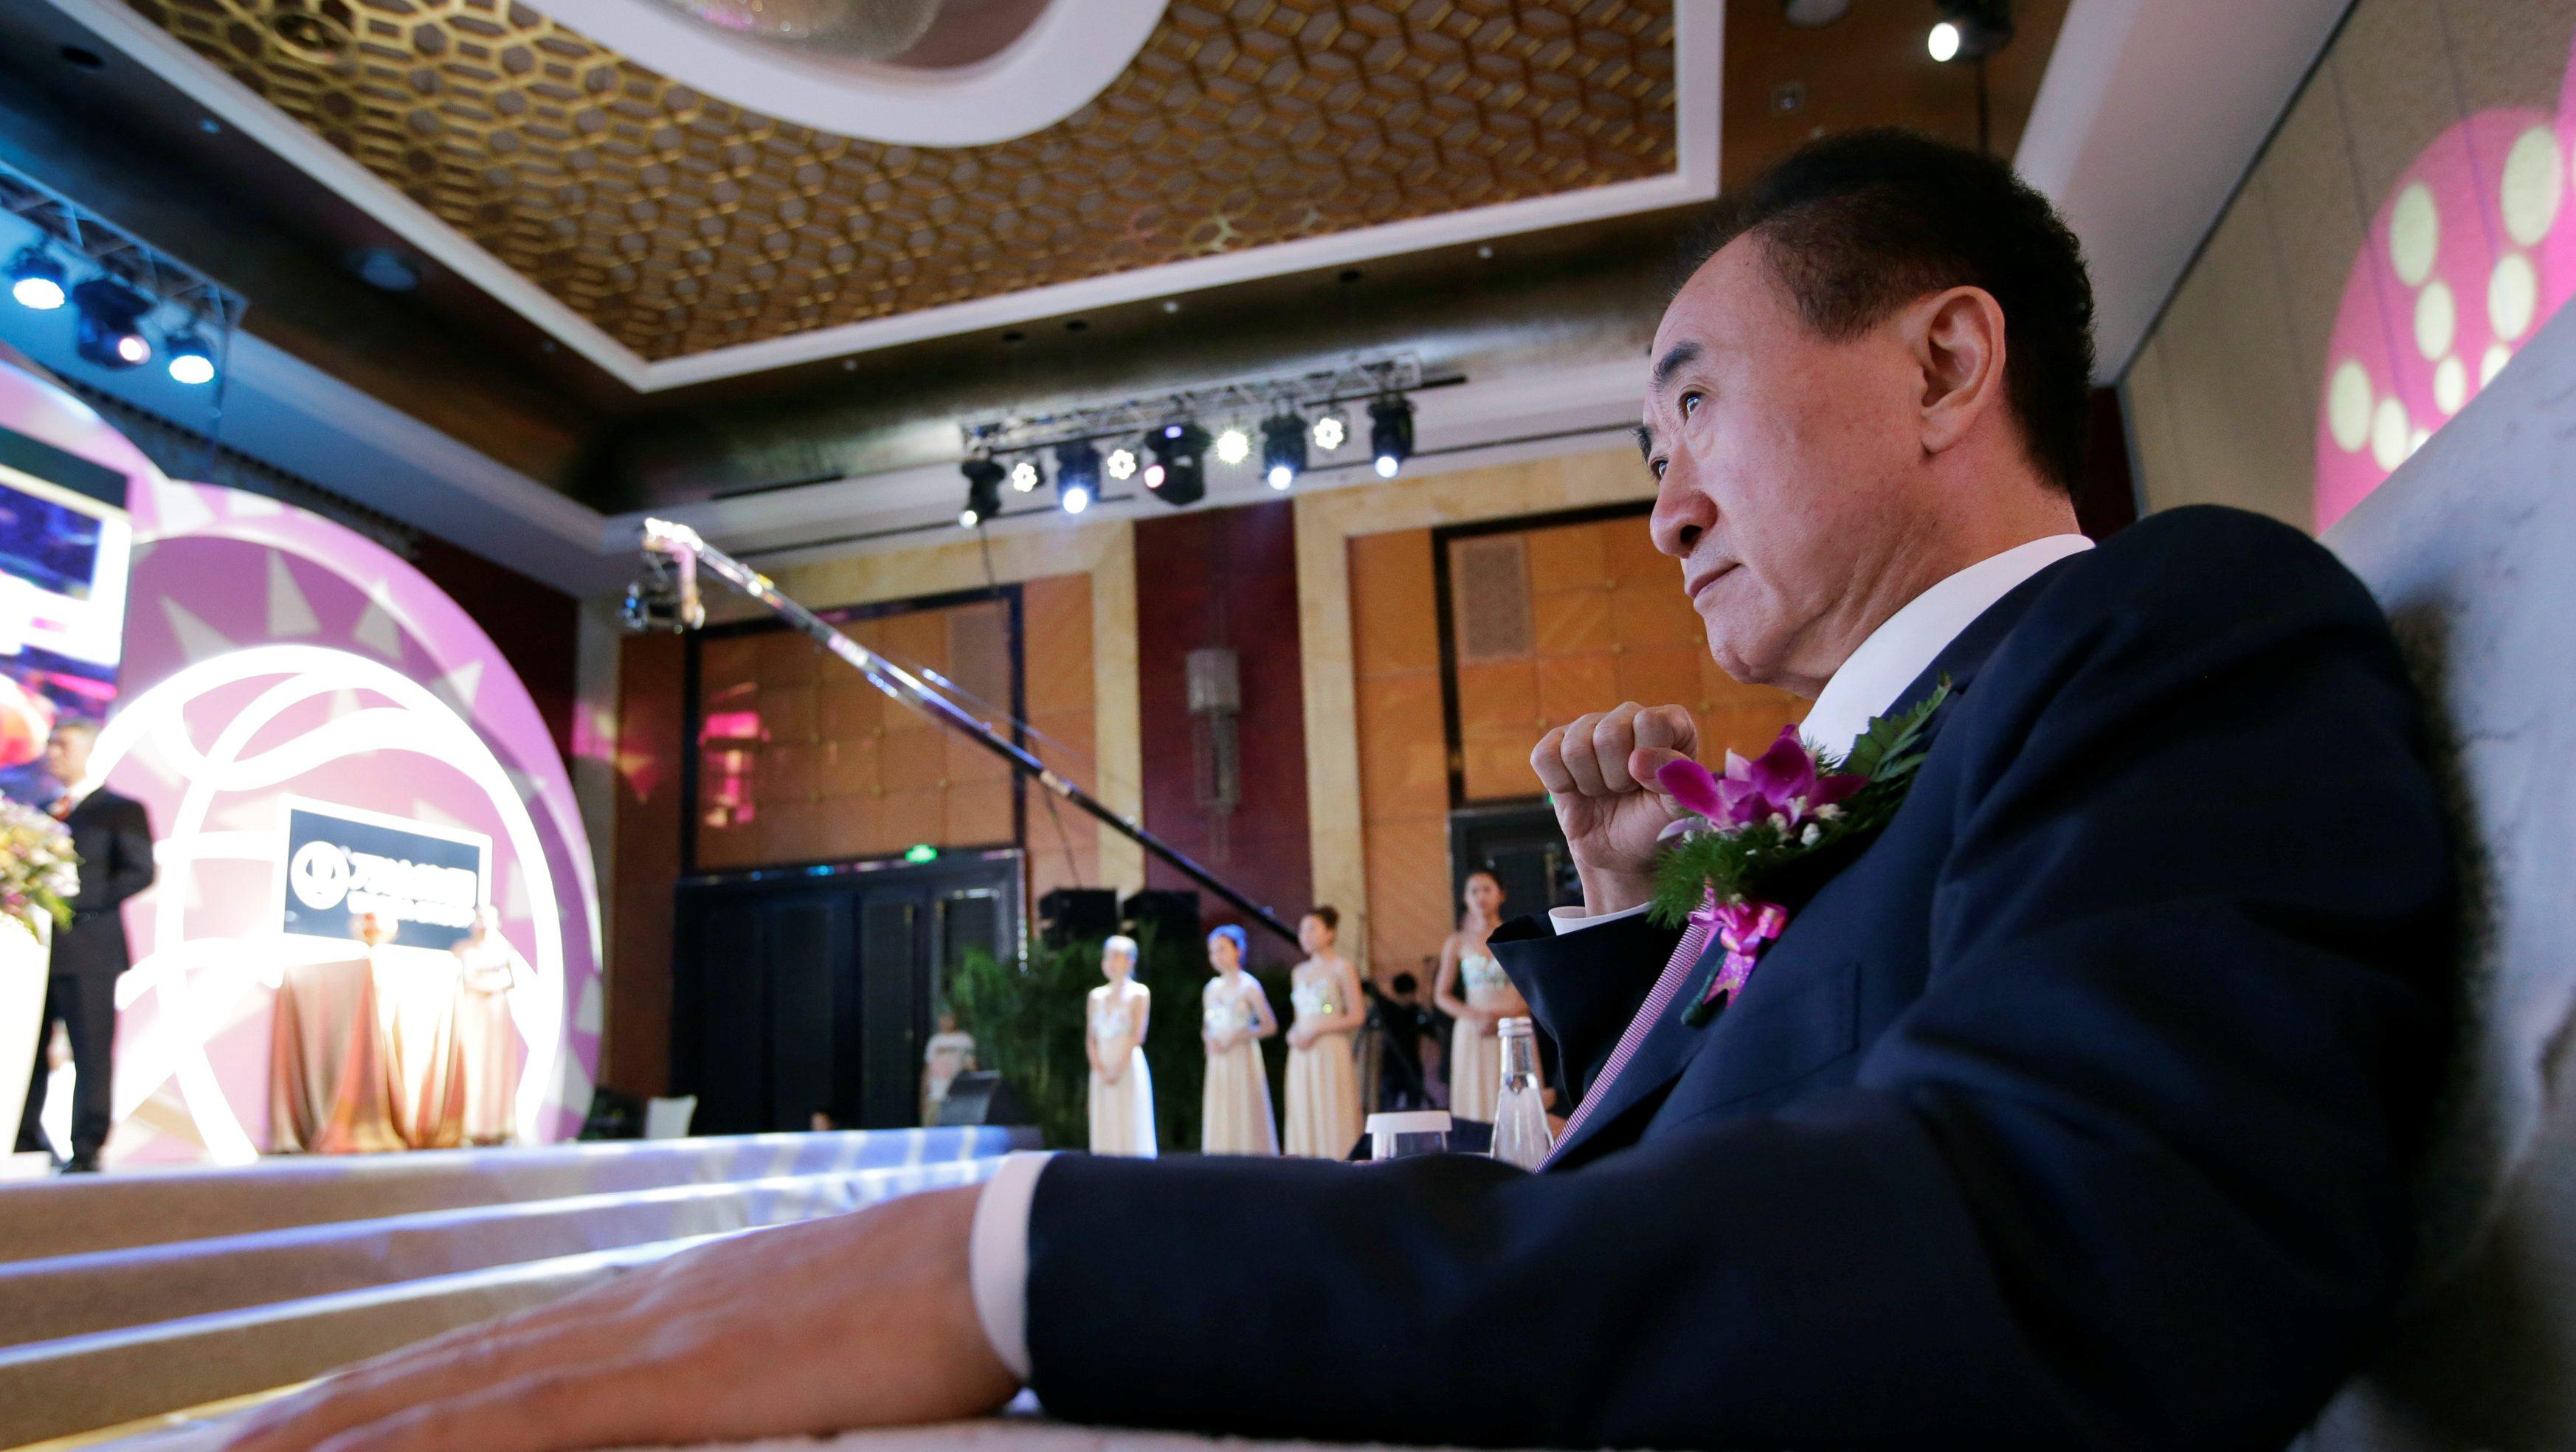 Wang Jianlin, chairman of the Wanda Group, attends a signing ceremony for the strategic partnership between FIBA and Wanda Group in Beijing, China June 16, 2016. REUTERS/Jason Lee